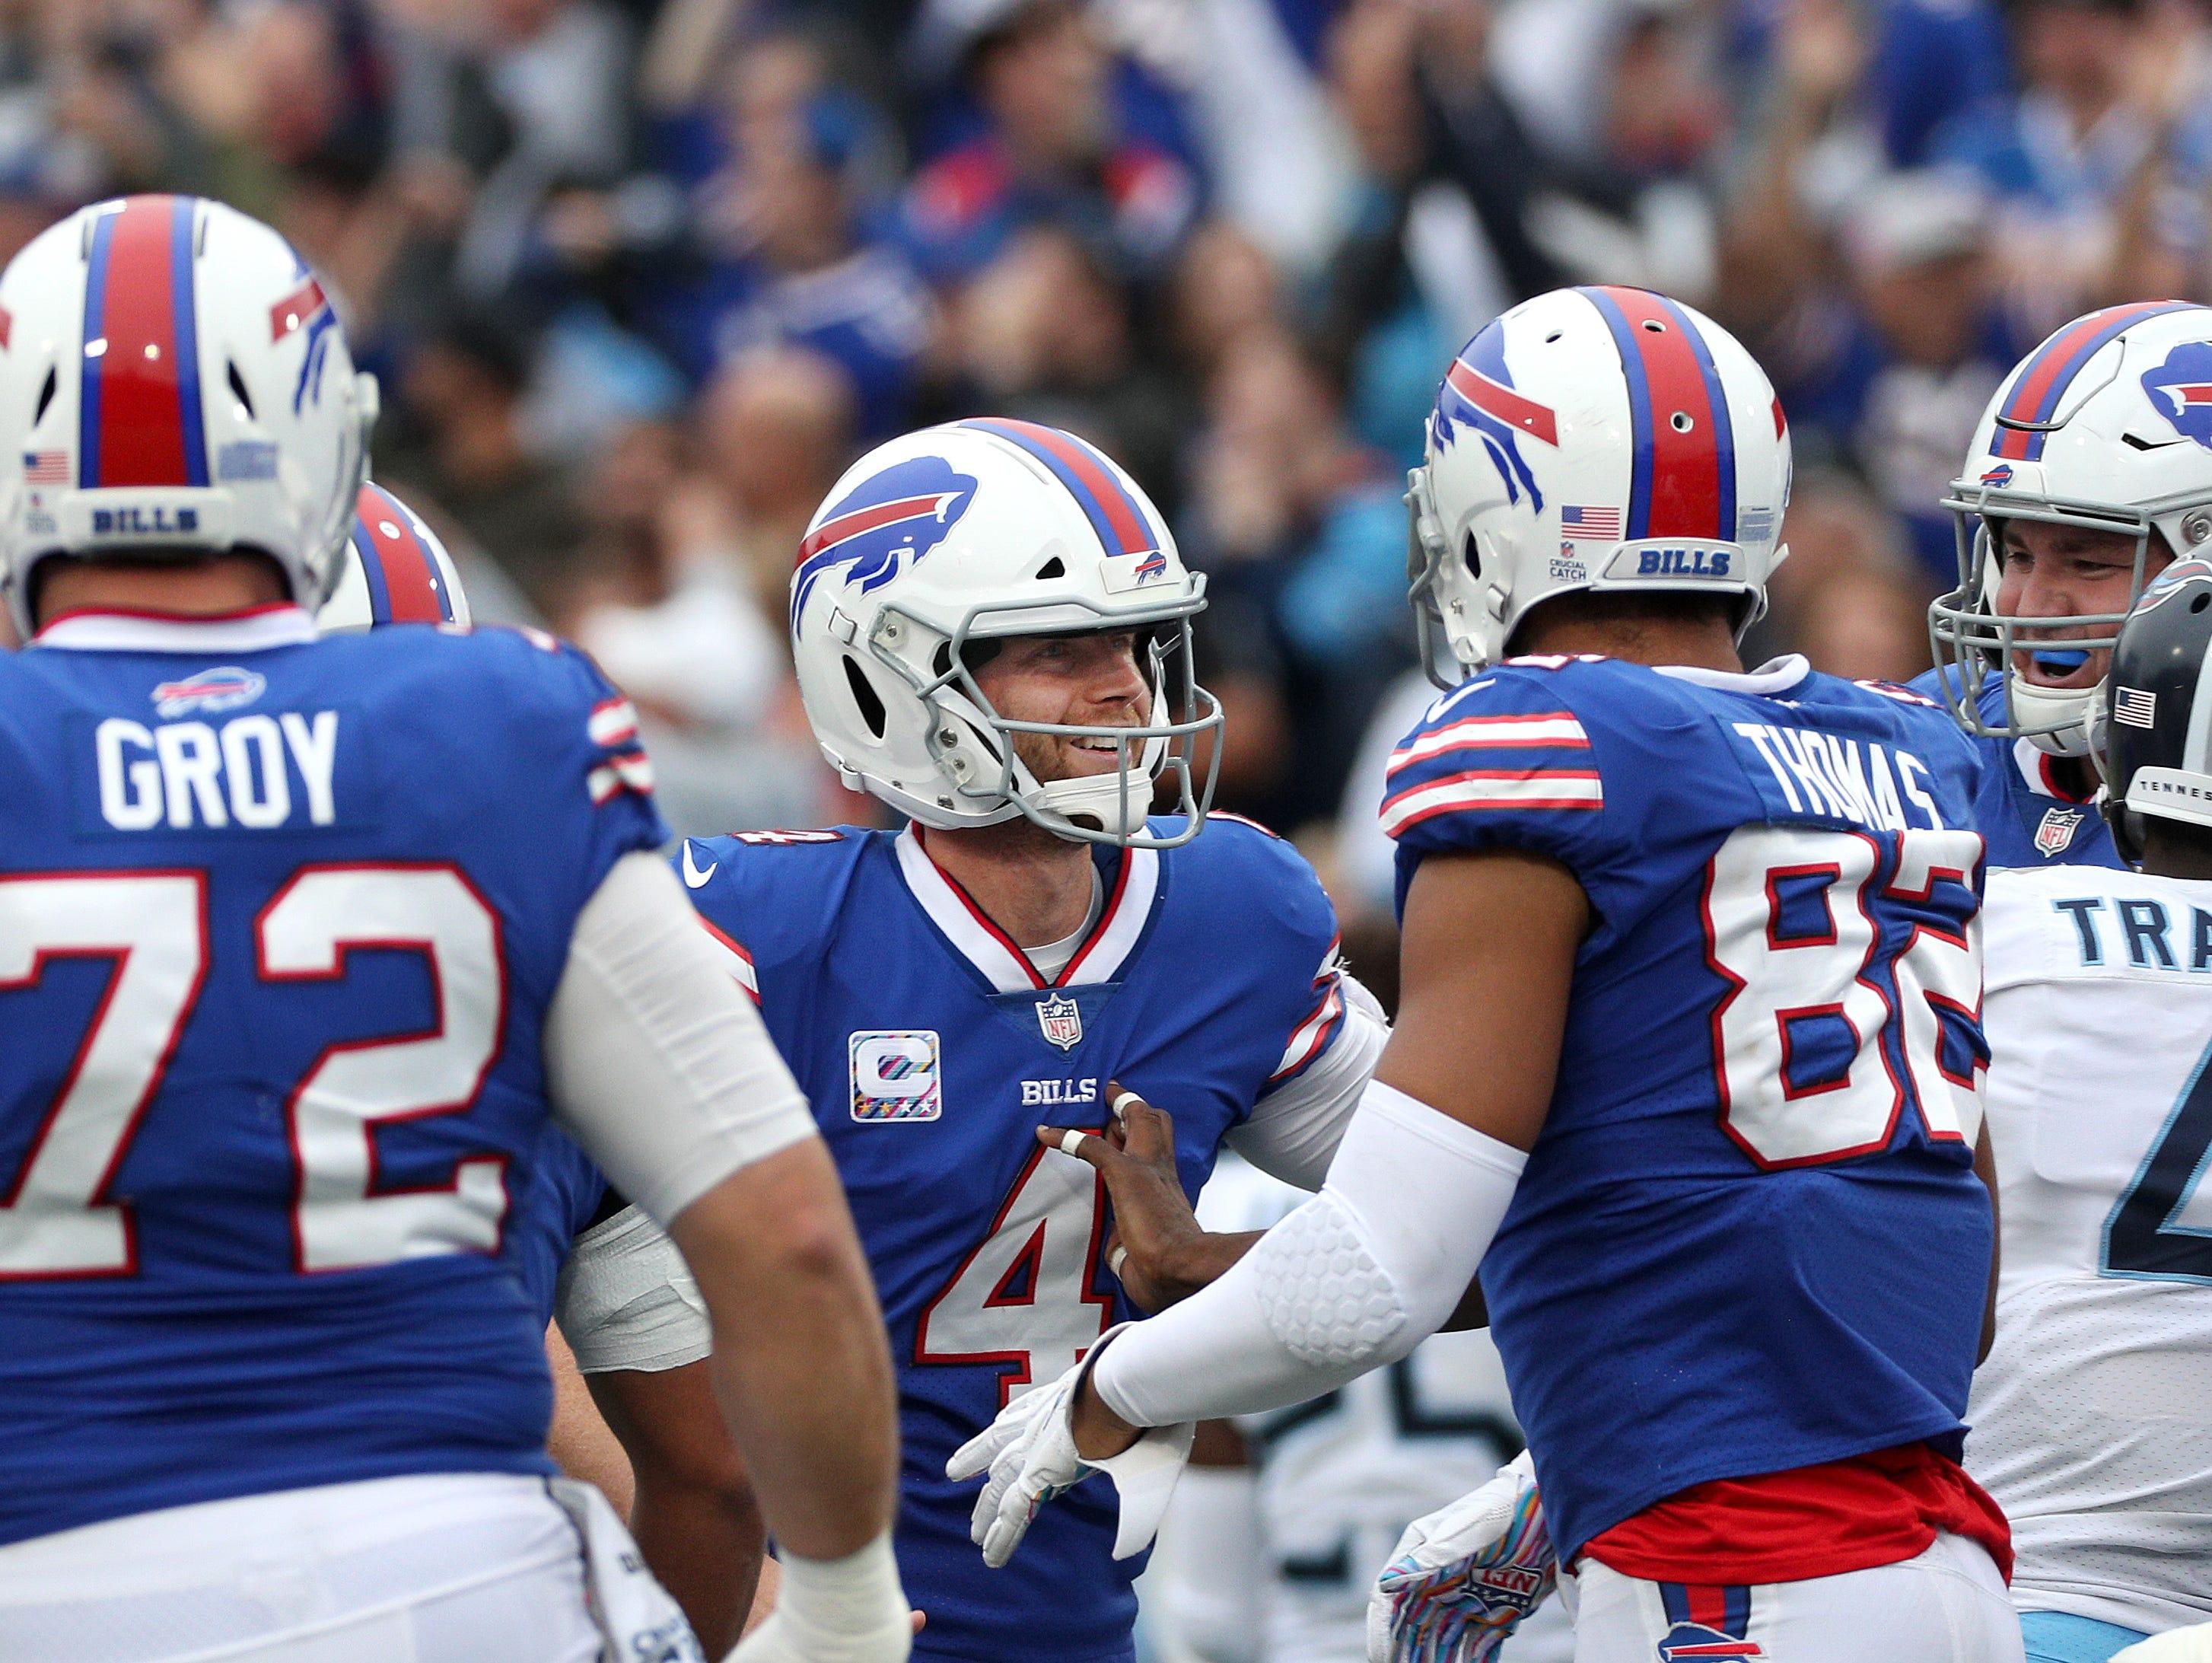 Bill kicker Stephen Hauschka celebrates his 46-yard game winning field goal to beat the Titans 13-12.